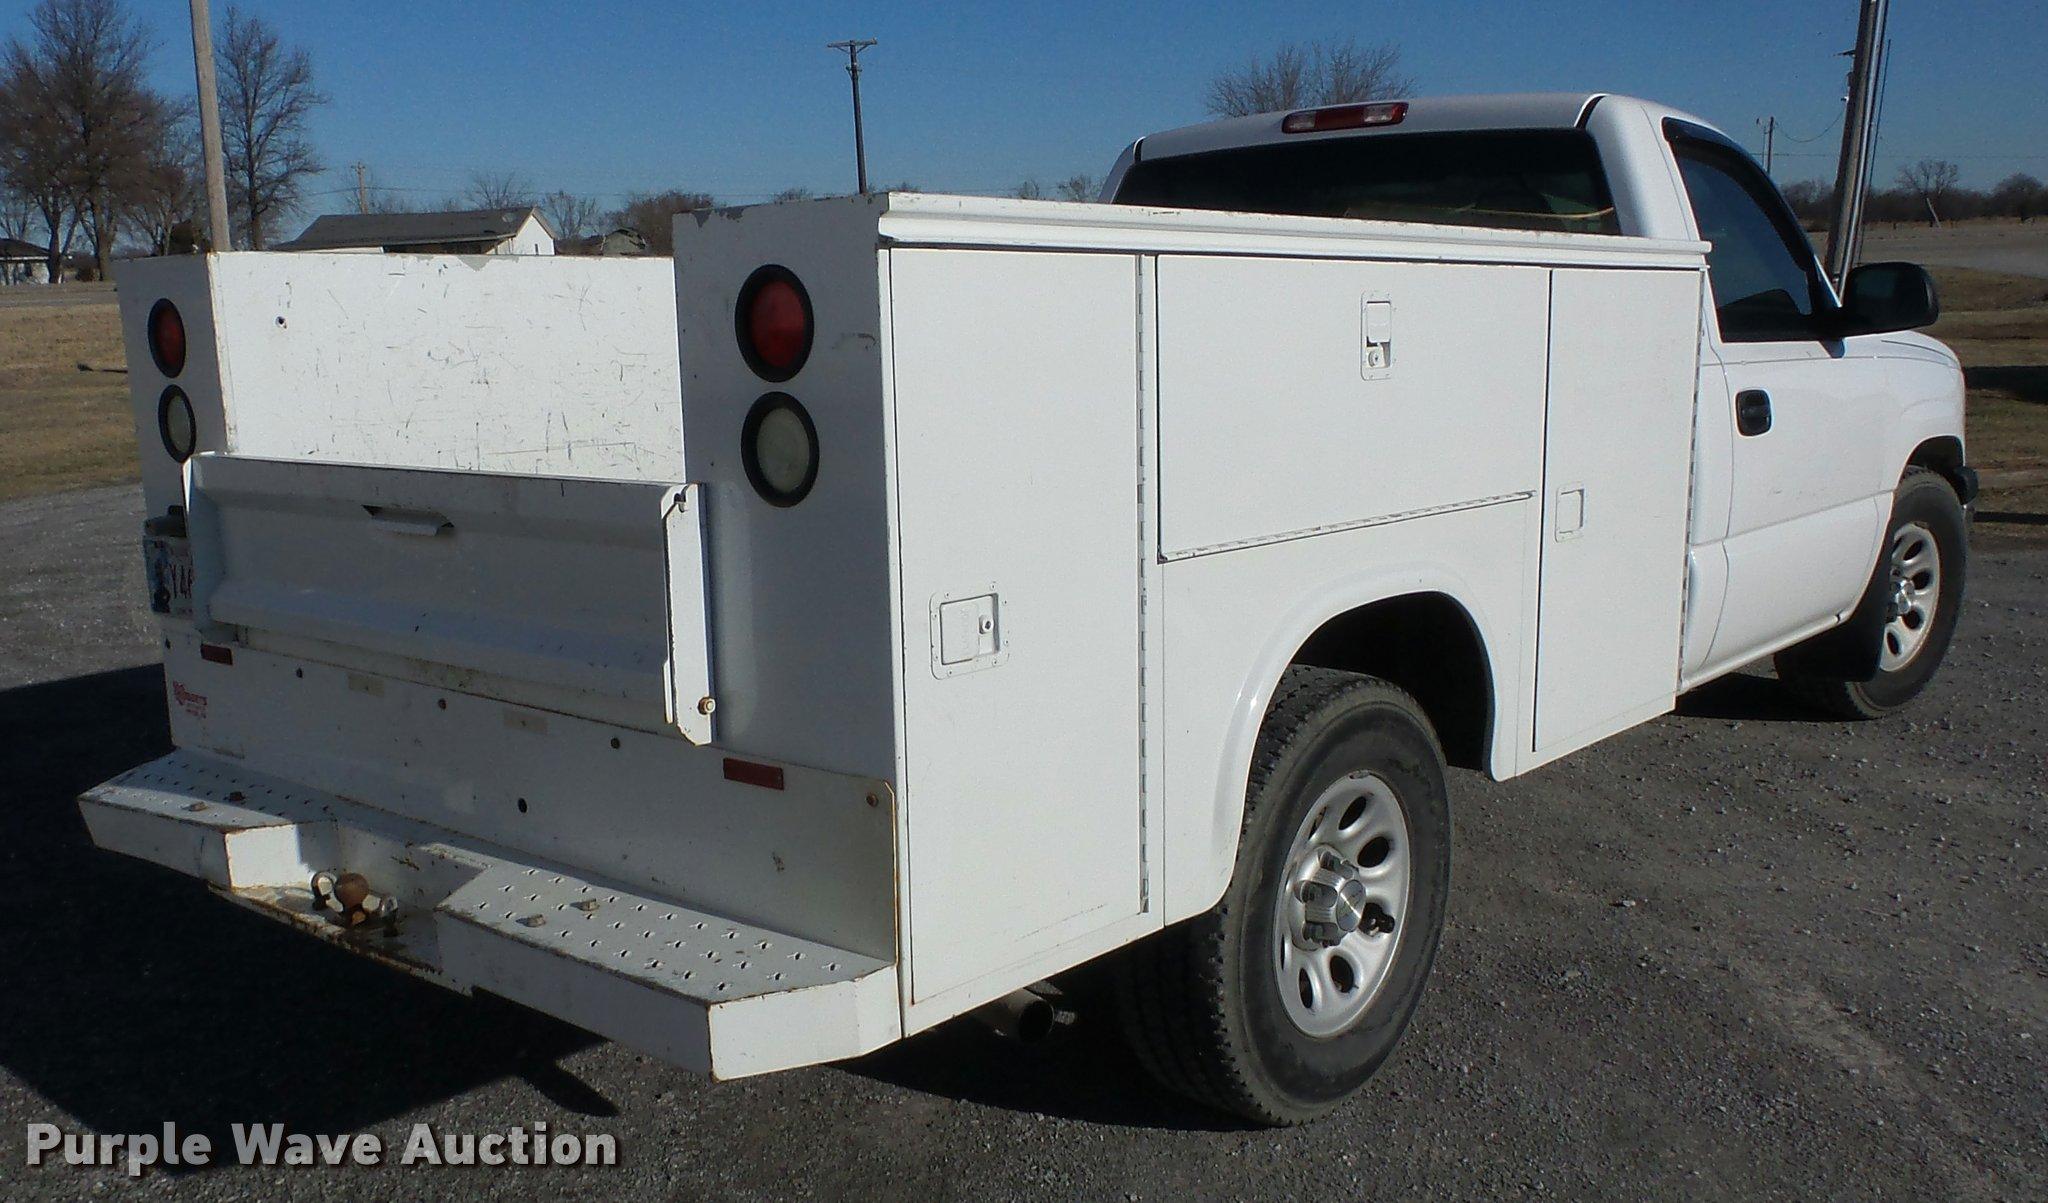 2005 Chevrolet Silverado 1500 utility bed pickup truck